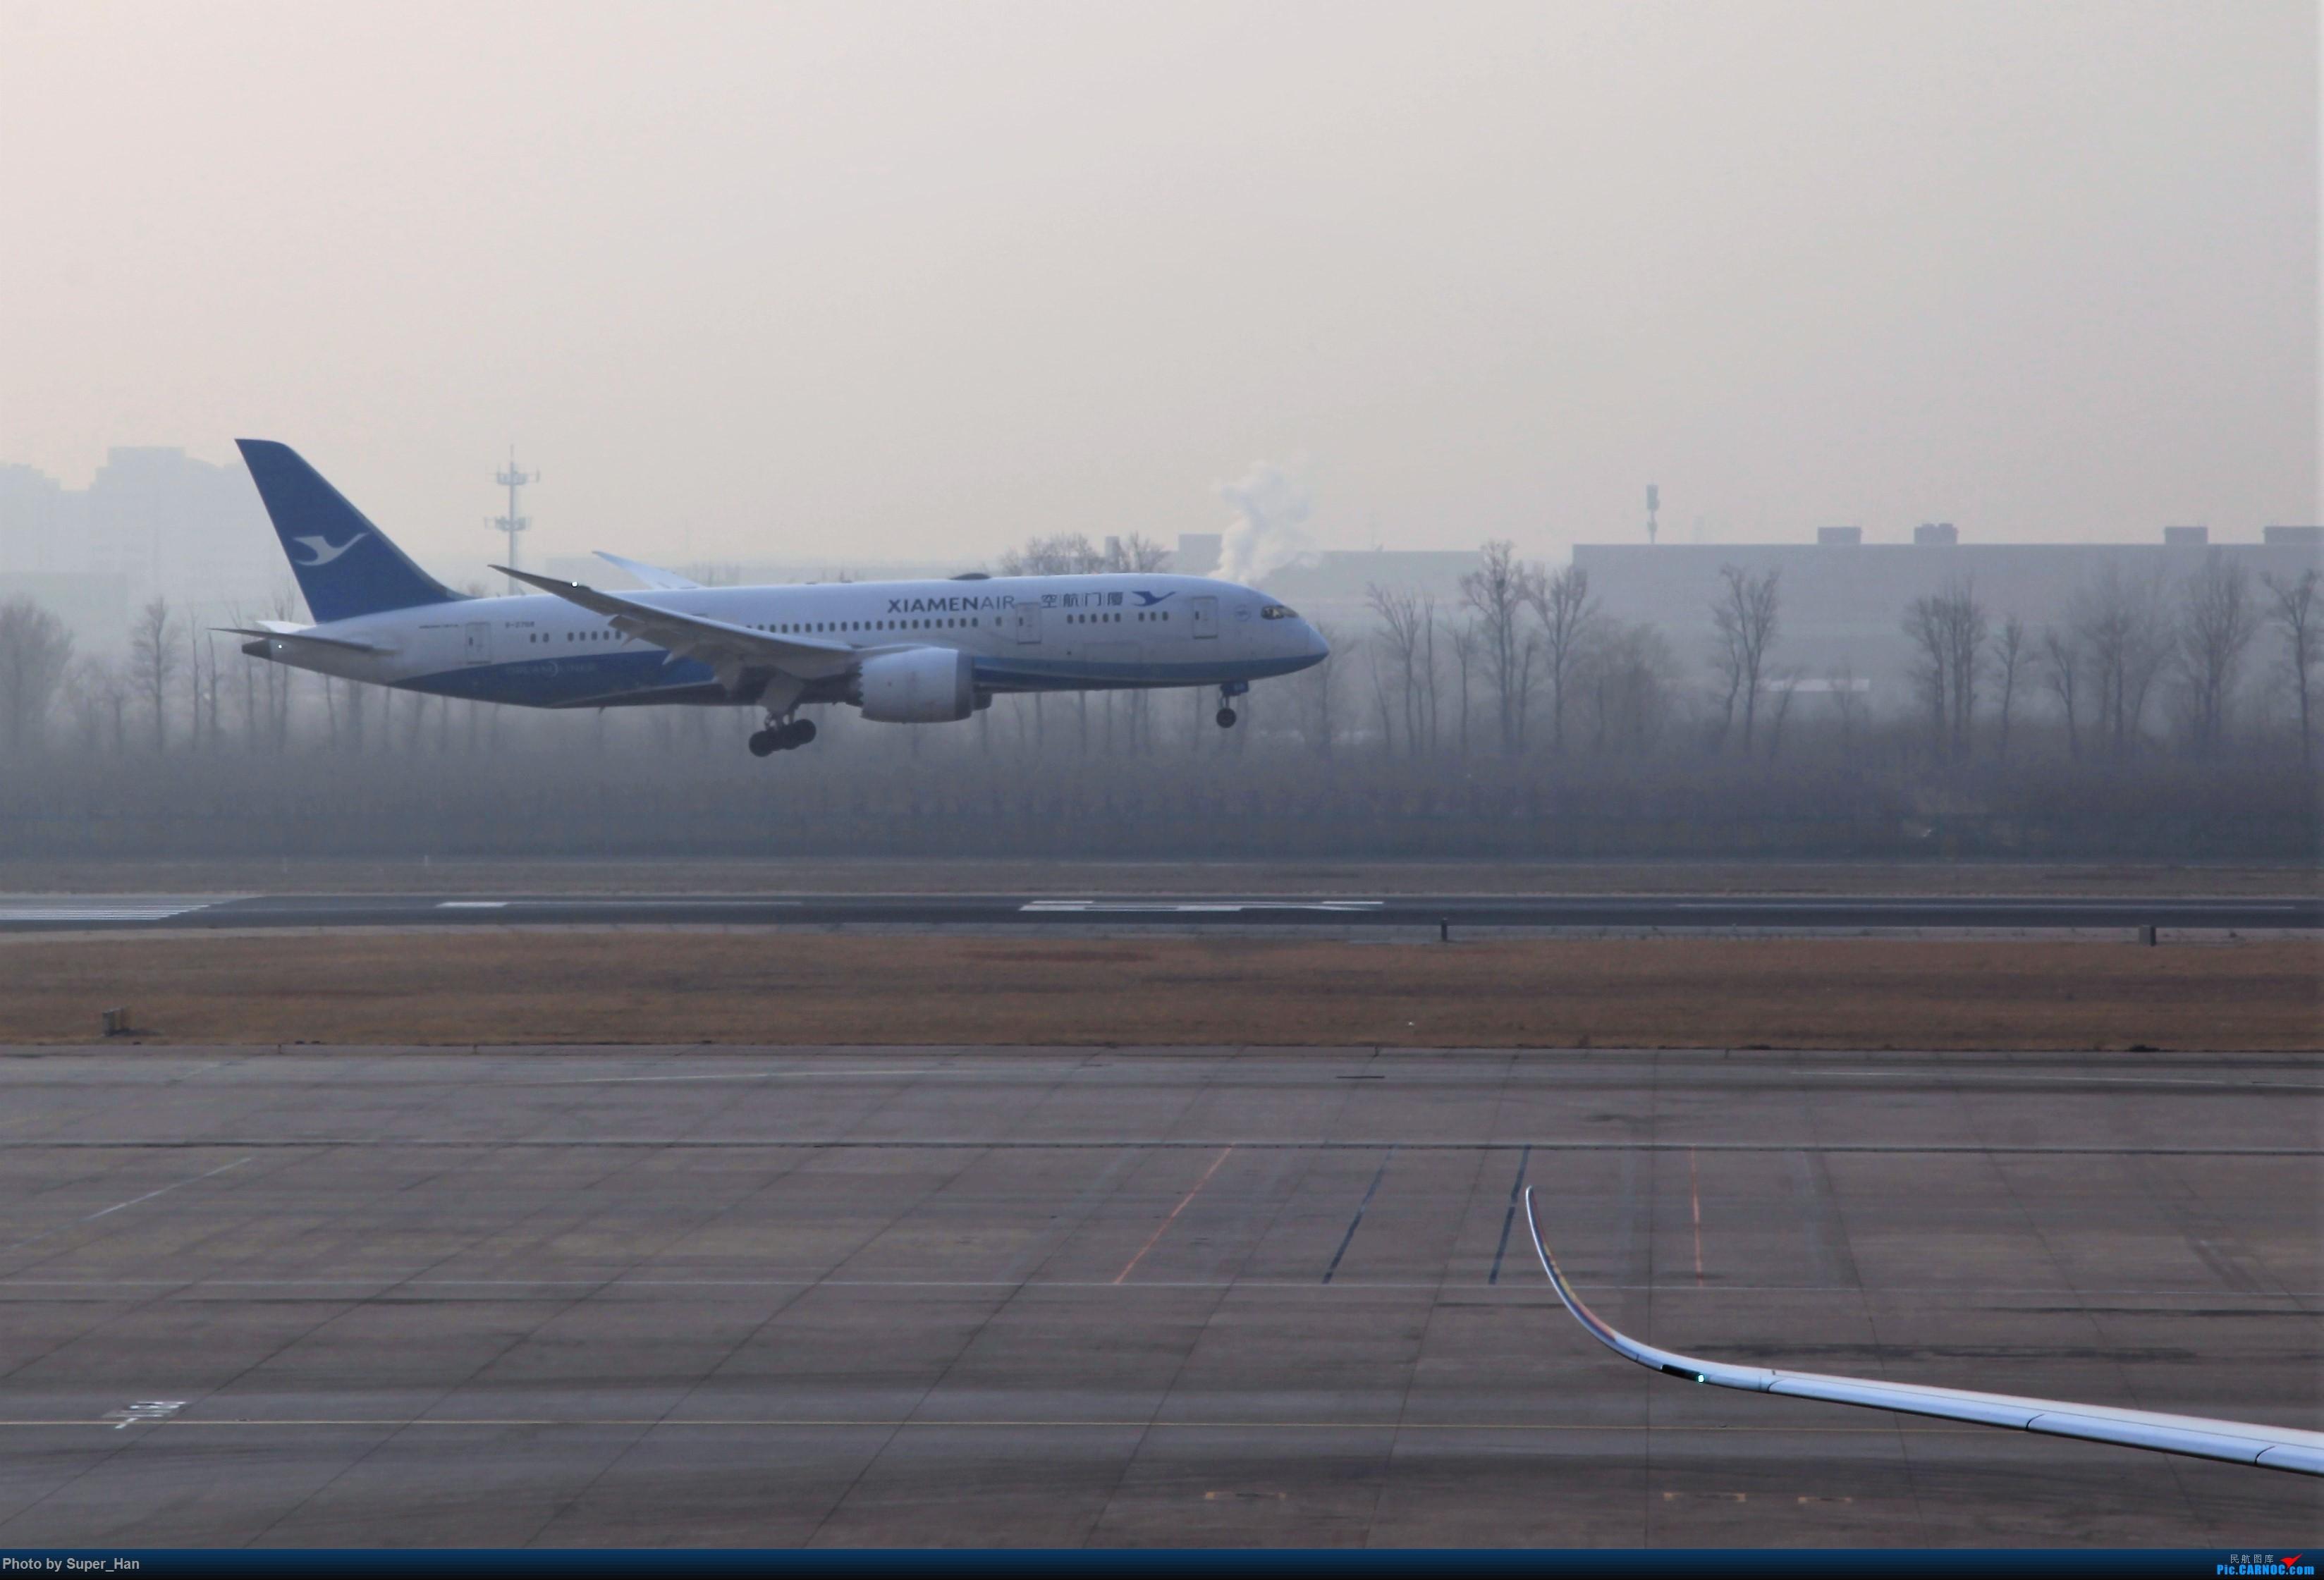 Re:[原创]2019虹桥出发飞北京第一拍 BOEING 787-8 B-2768 中国北京首都国际机场